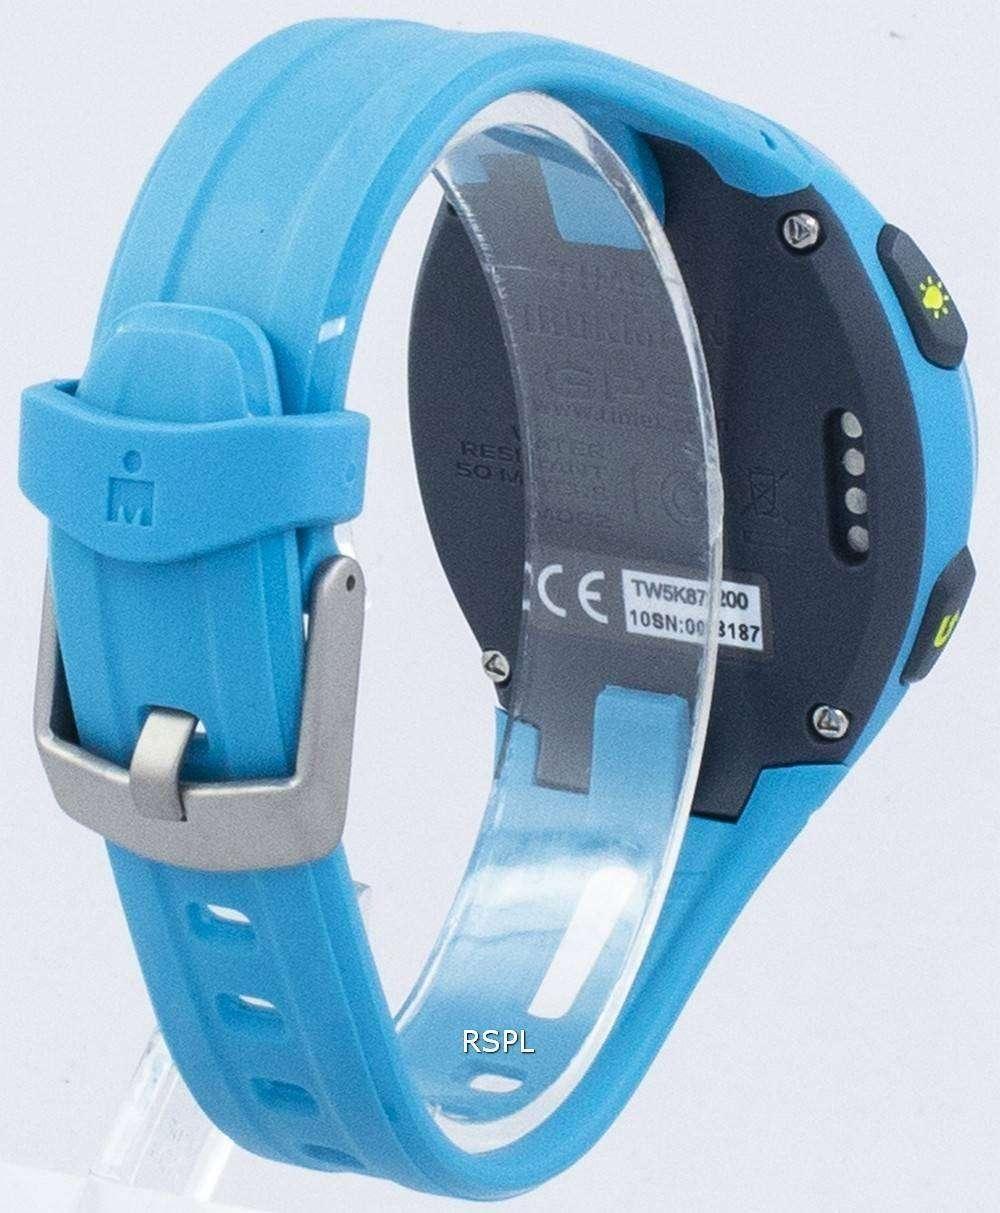 c87553303 Timex Ironman Run X20 GPS Indiglo Digital TW5K87600 Unisex Watch ...